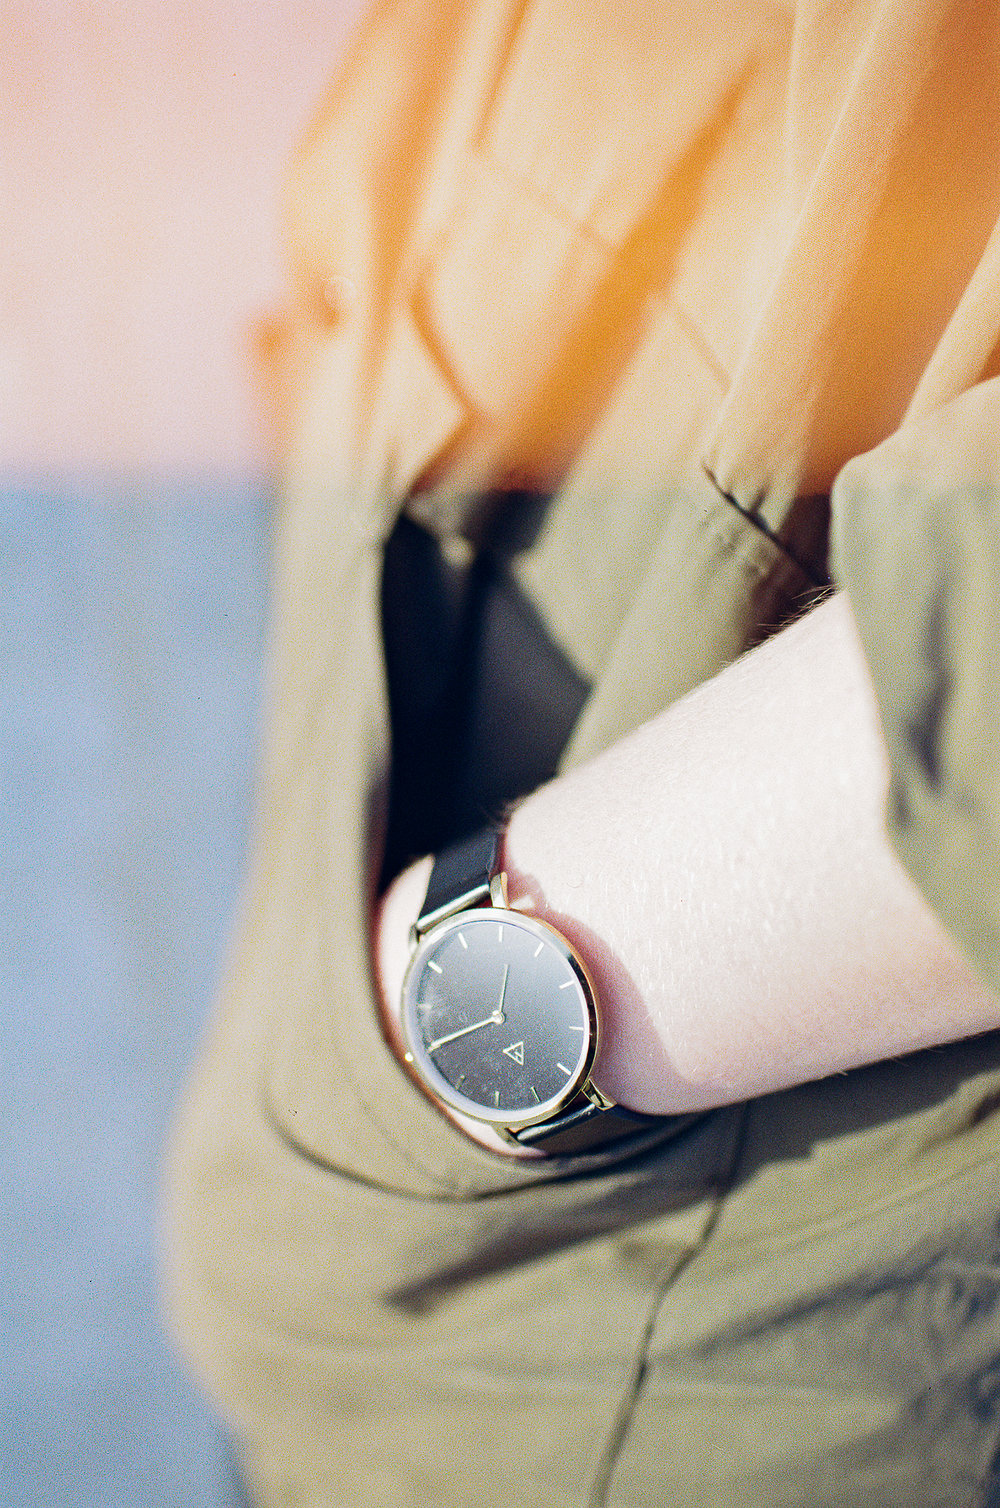 107-Watchit!-and-Oak-+-Fort-PhotoshootA.JPG